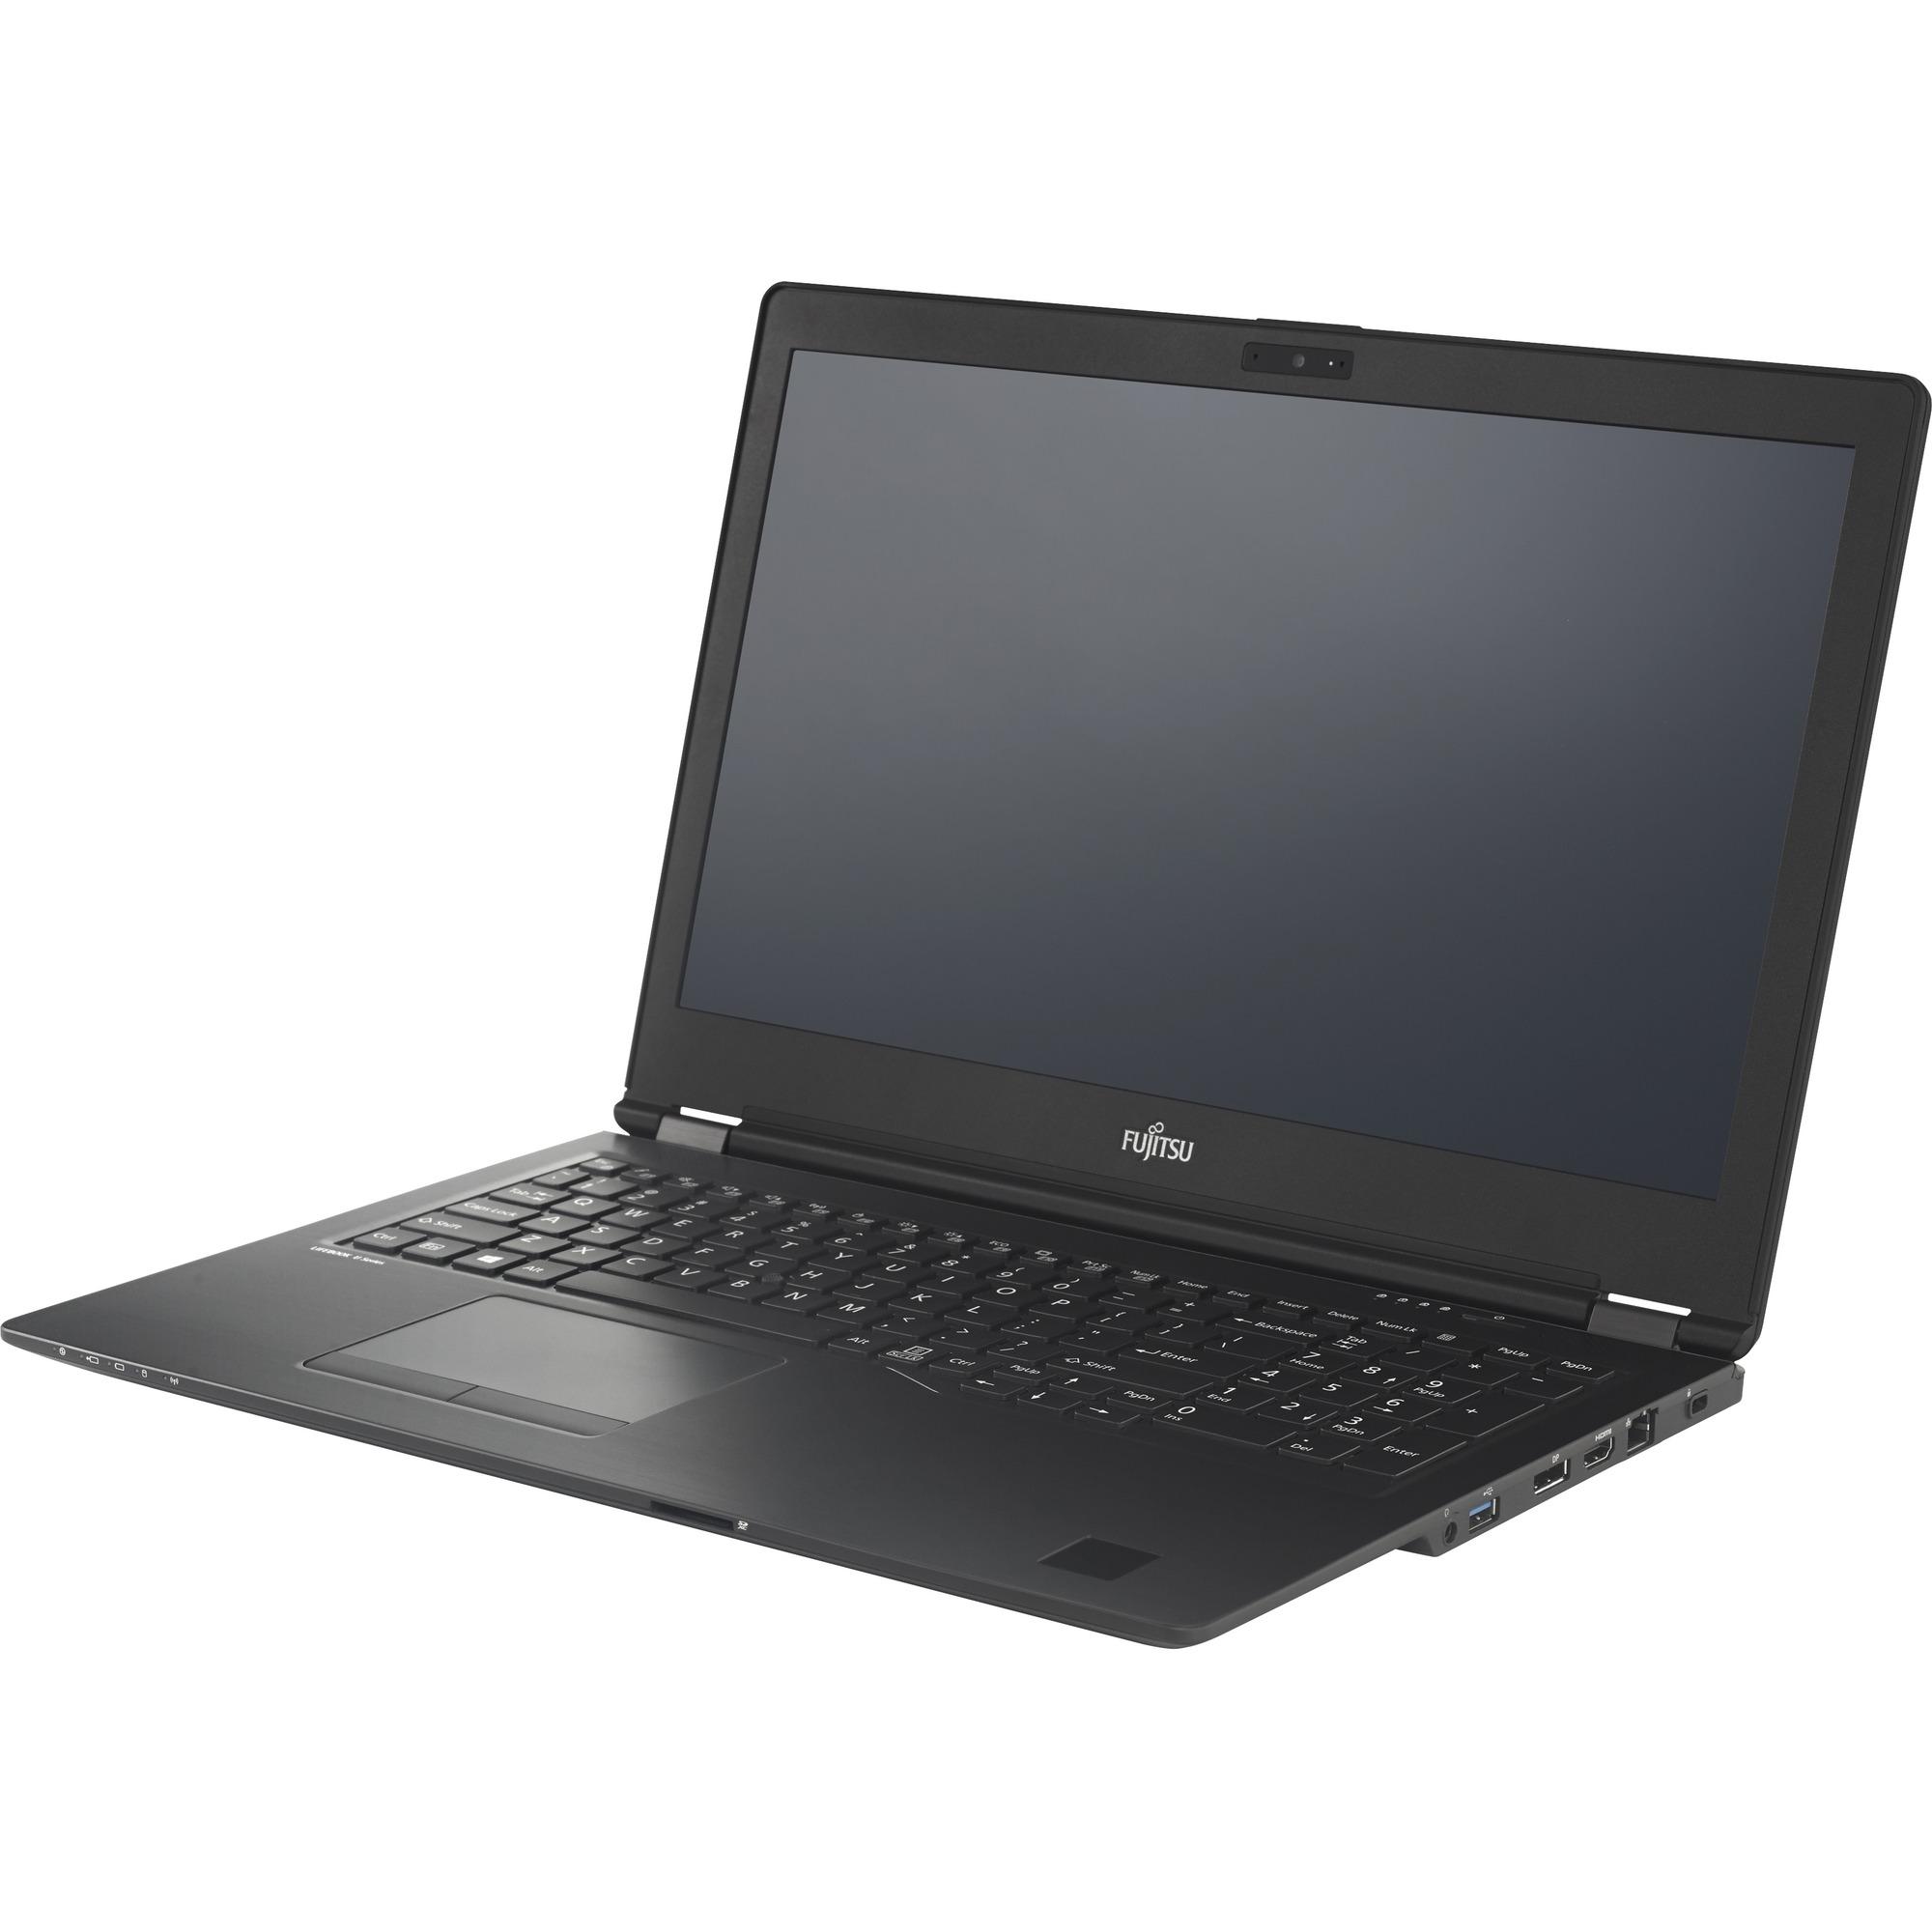 Fujitsu LIFEBOOK U747 35.6 cm 14inch Touchscreen LCD Notebook - Intel Core i7 7th Gen i7-7500U Dual-core 2 Core 2.70 GHz - 8 GB DDR4 SDRAM - 512 GB SSD - Windows